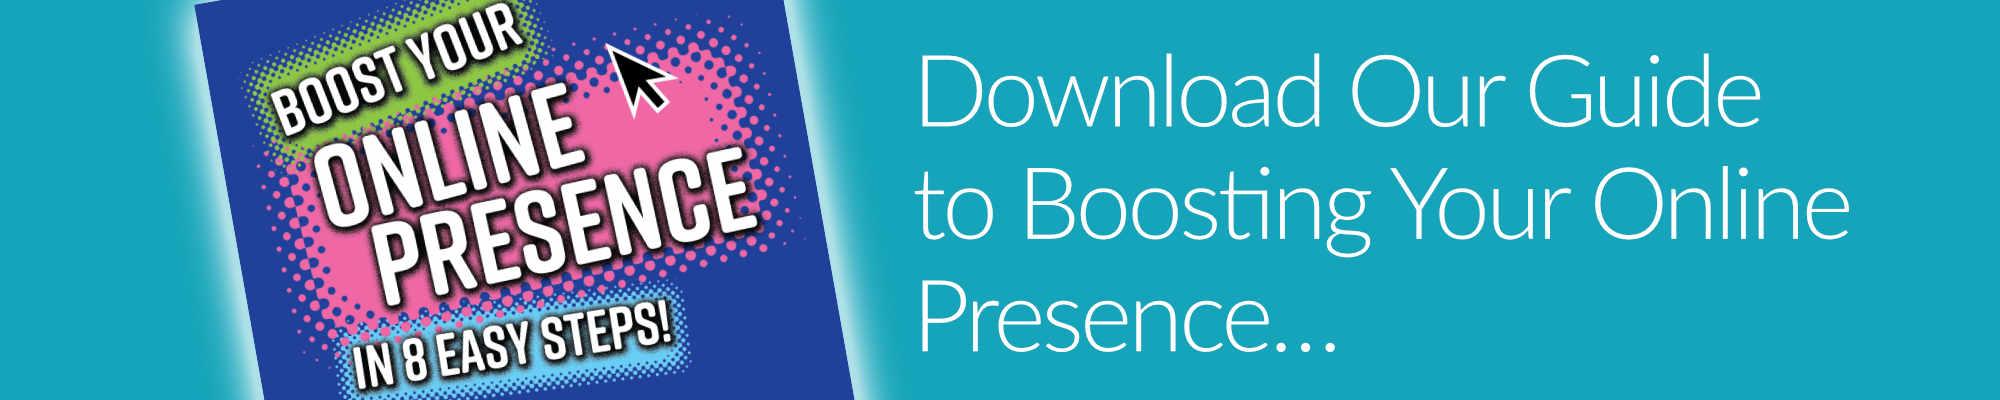 We Are Deeper Blue Digital Marketing Brochure Download